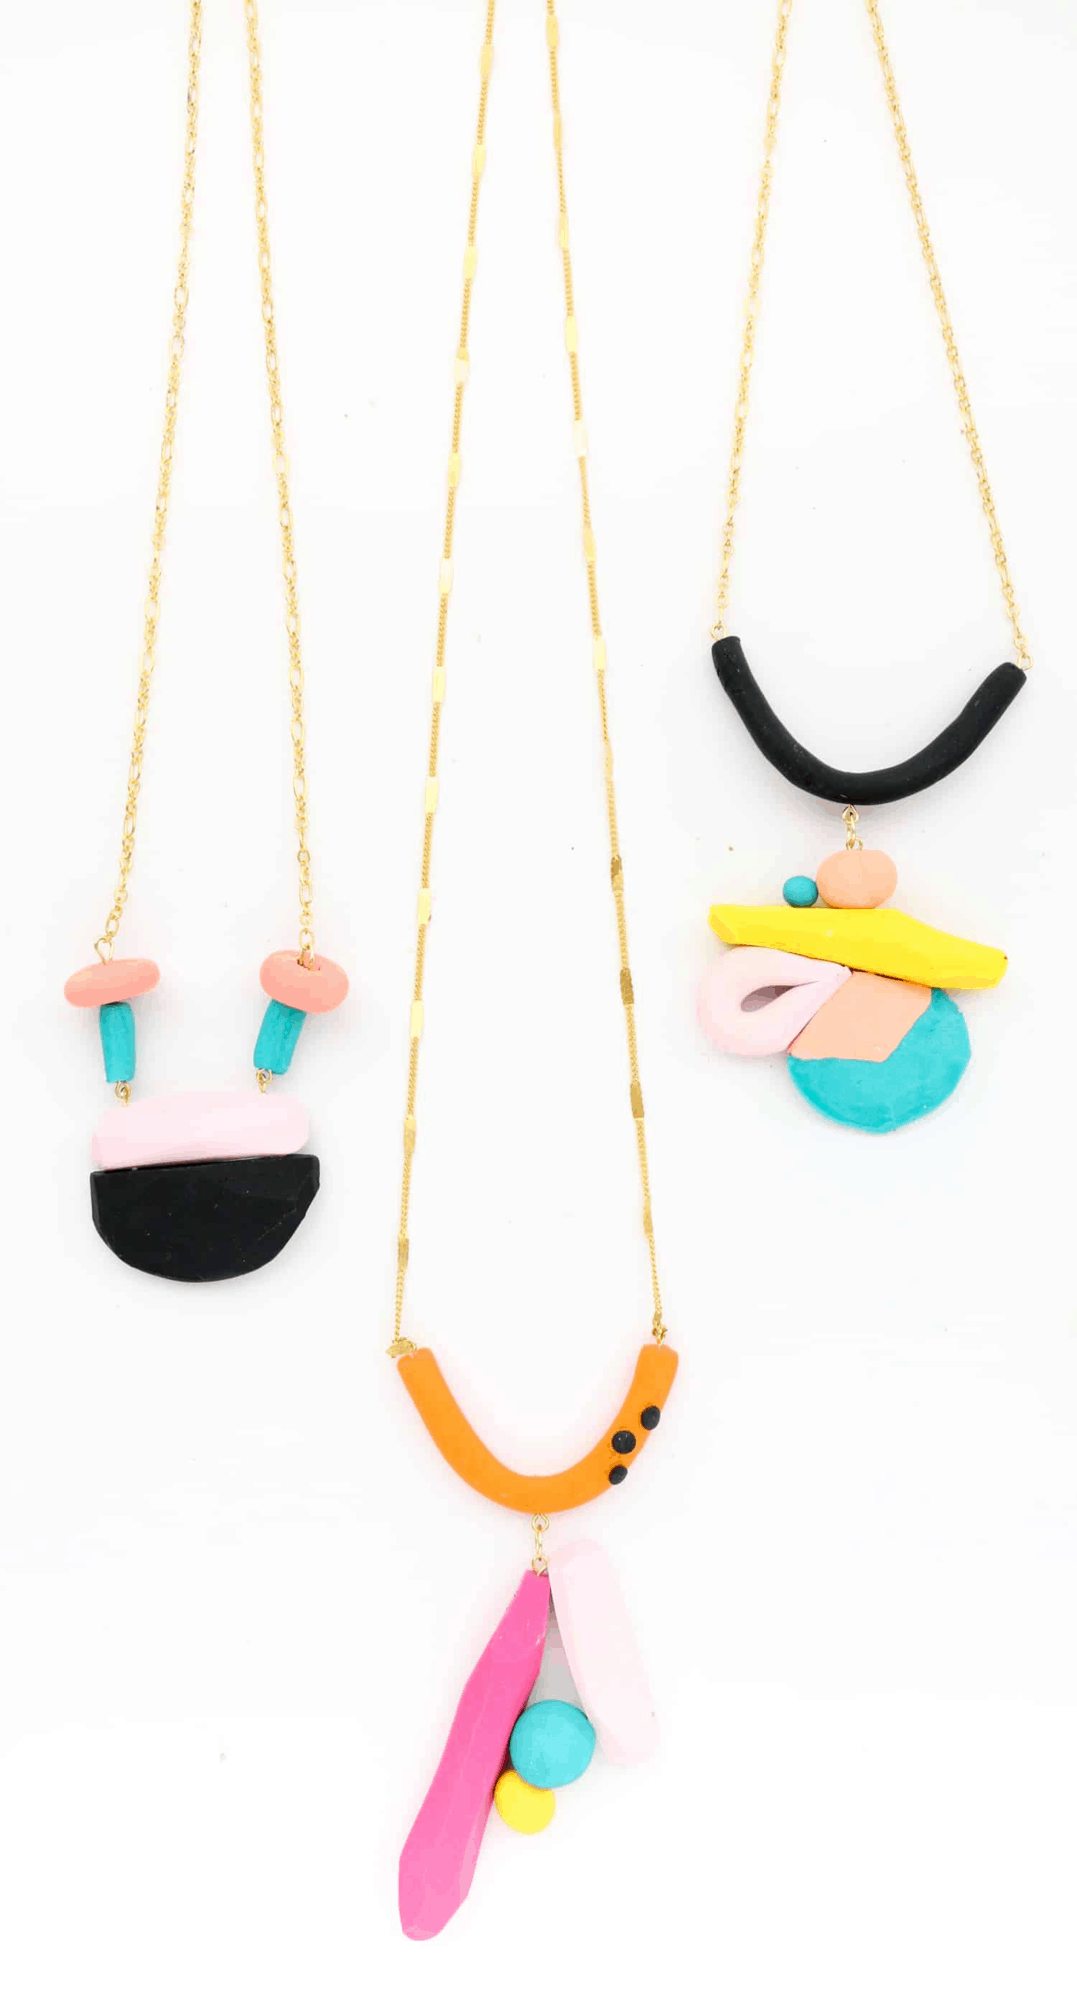 Colorful geometric necklace DIY